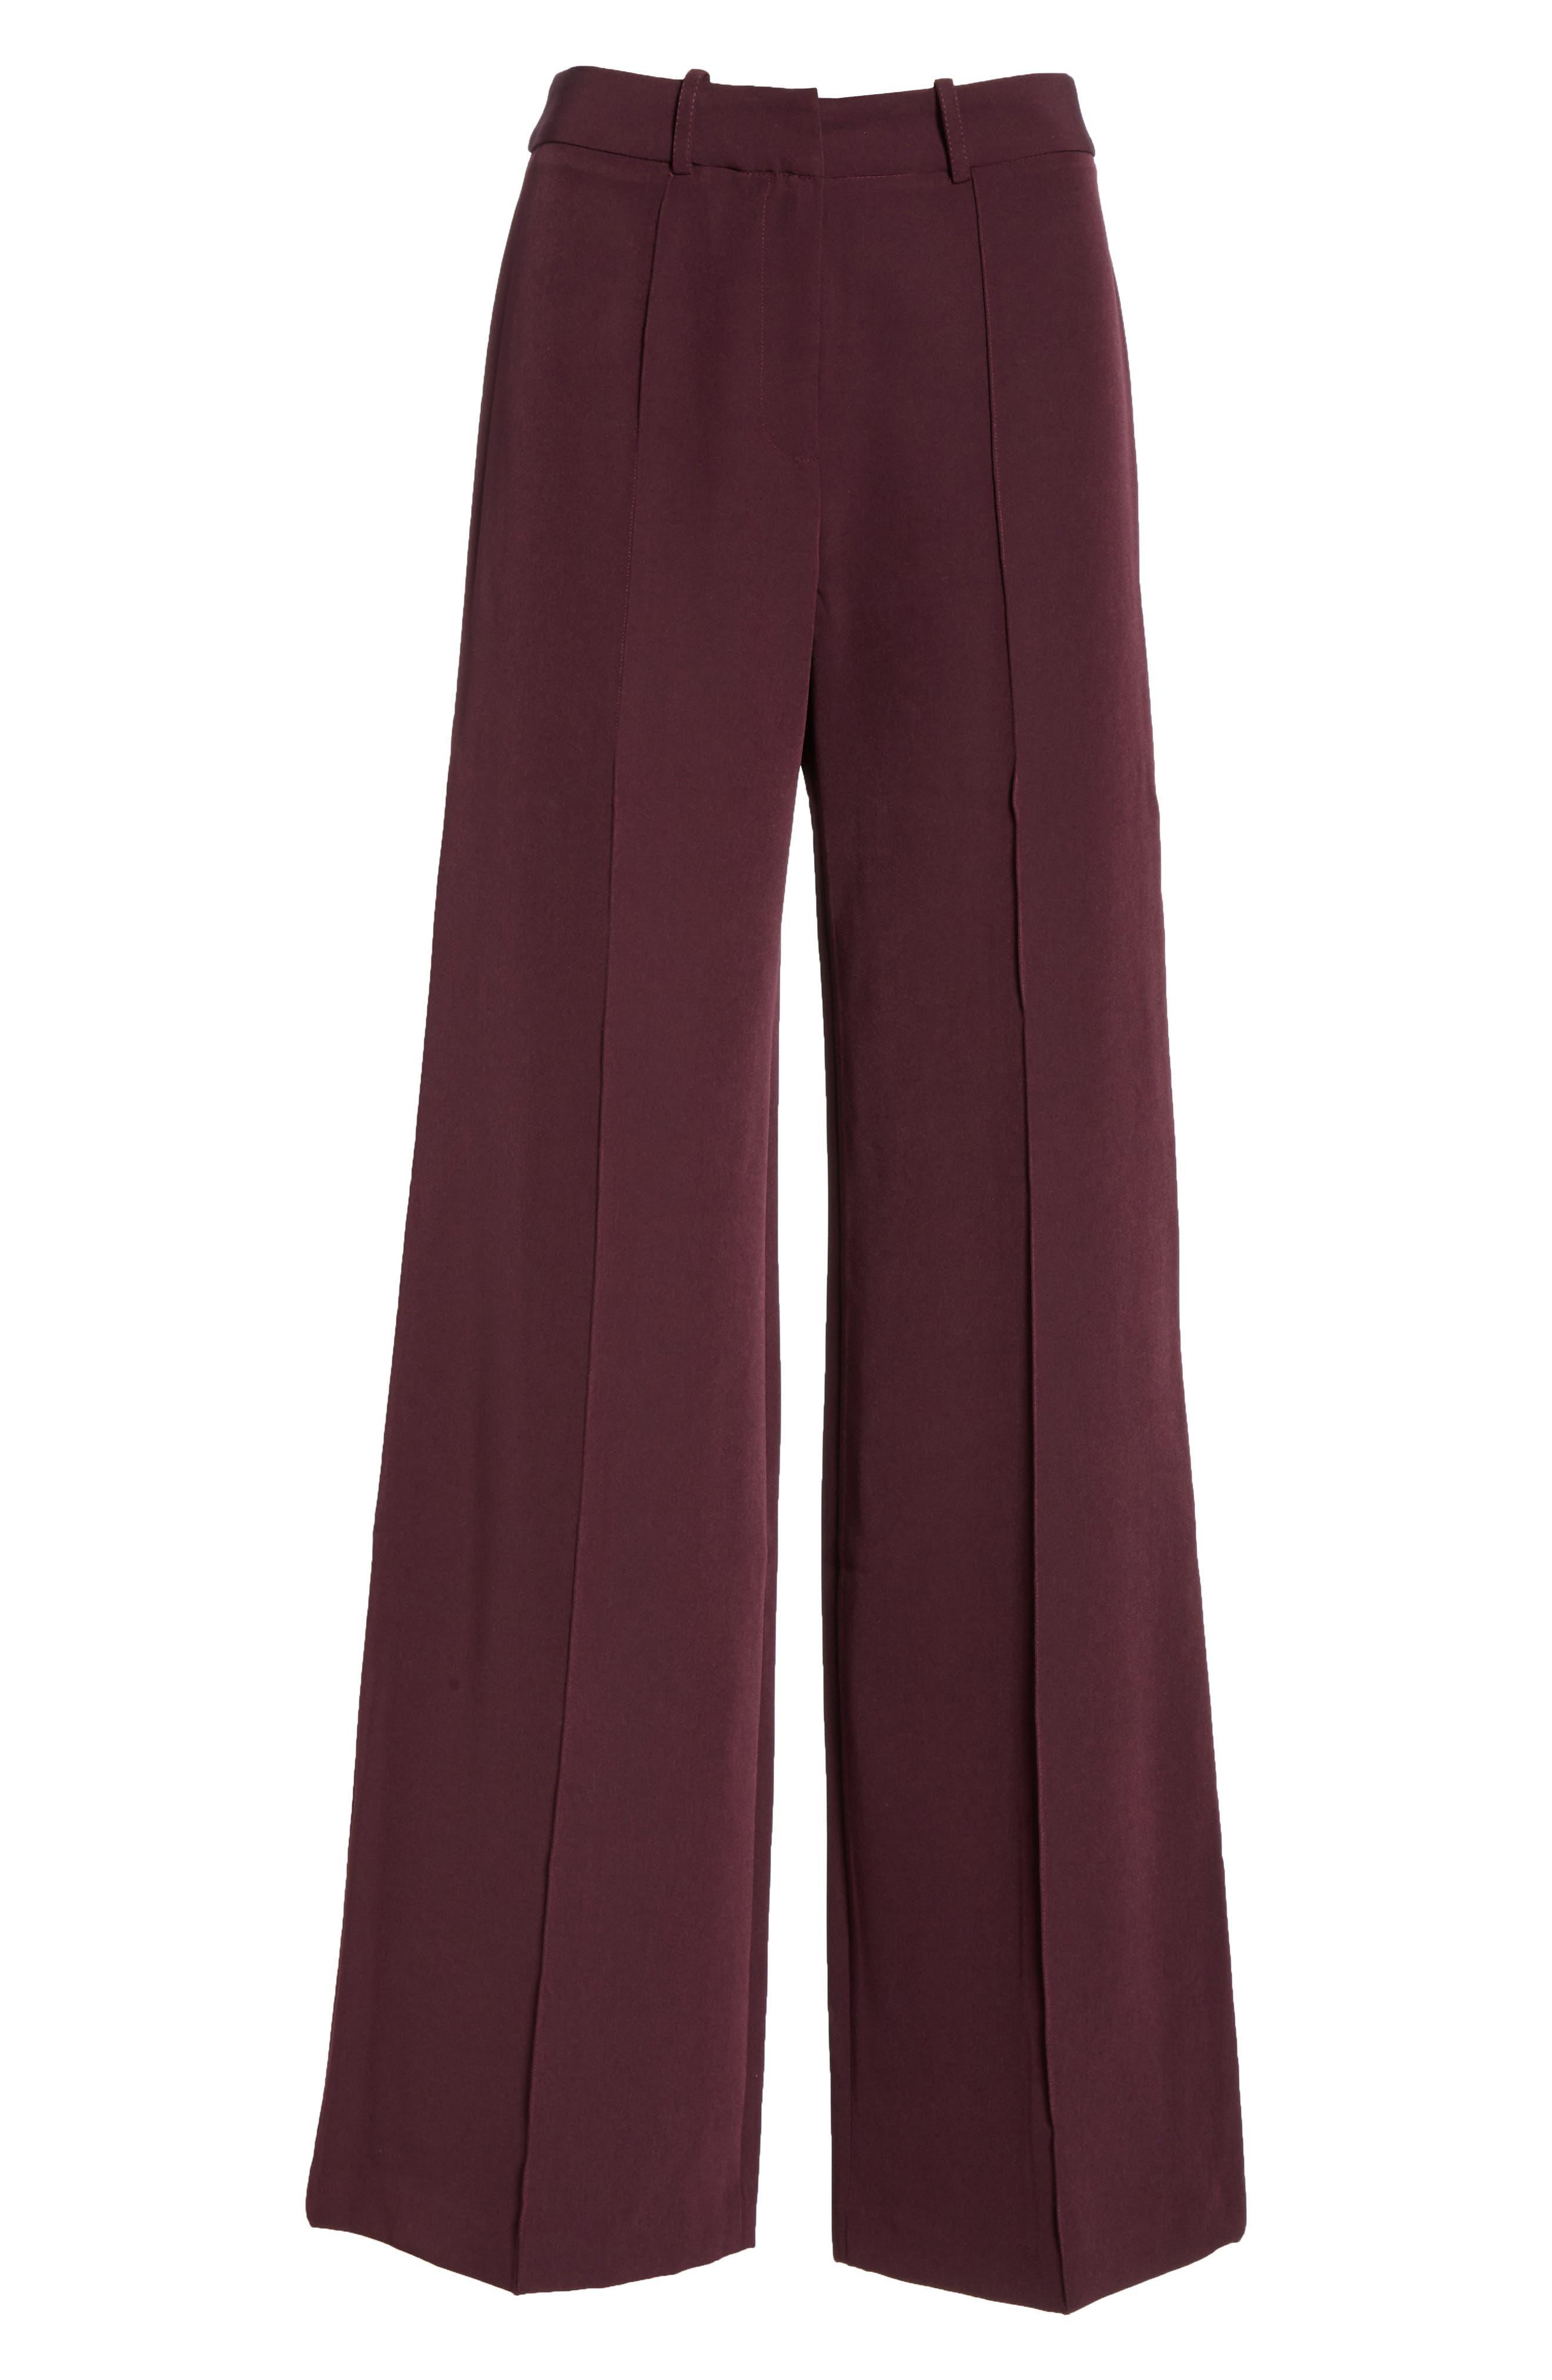 Hayden Seam Front Wide Leg Pants,                             Alternate thumbnail 7, color,                             400